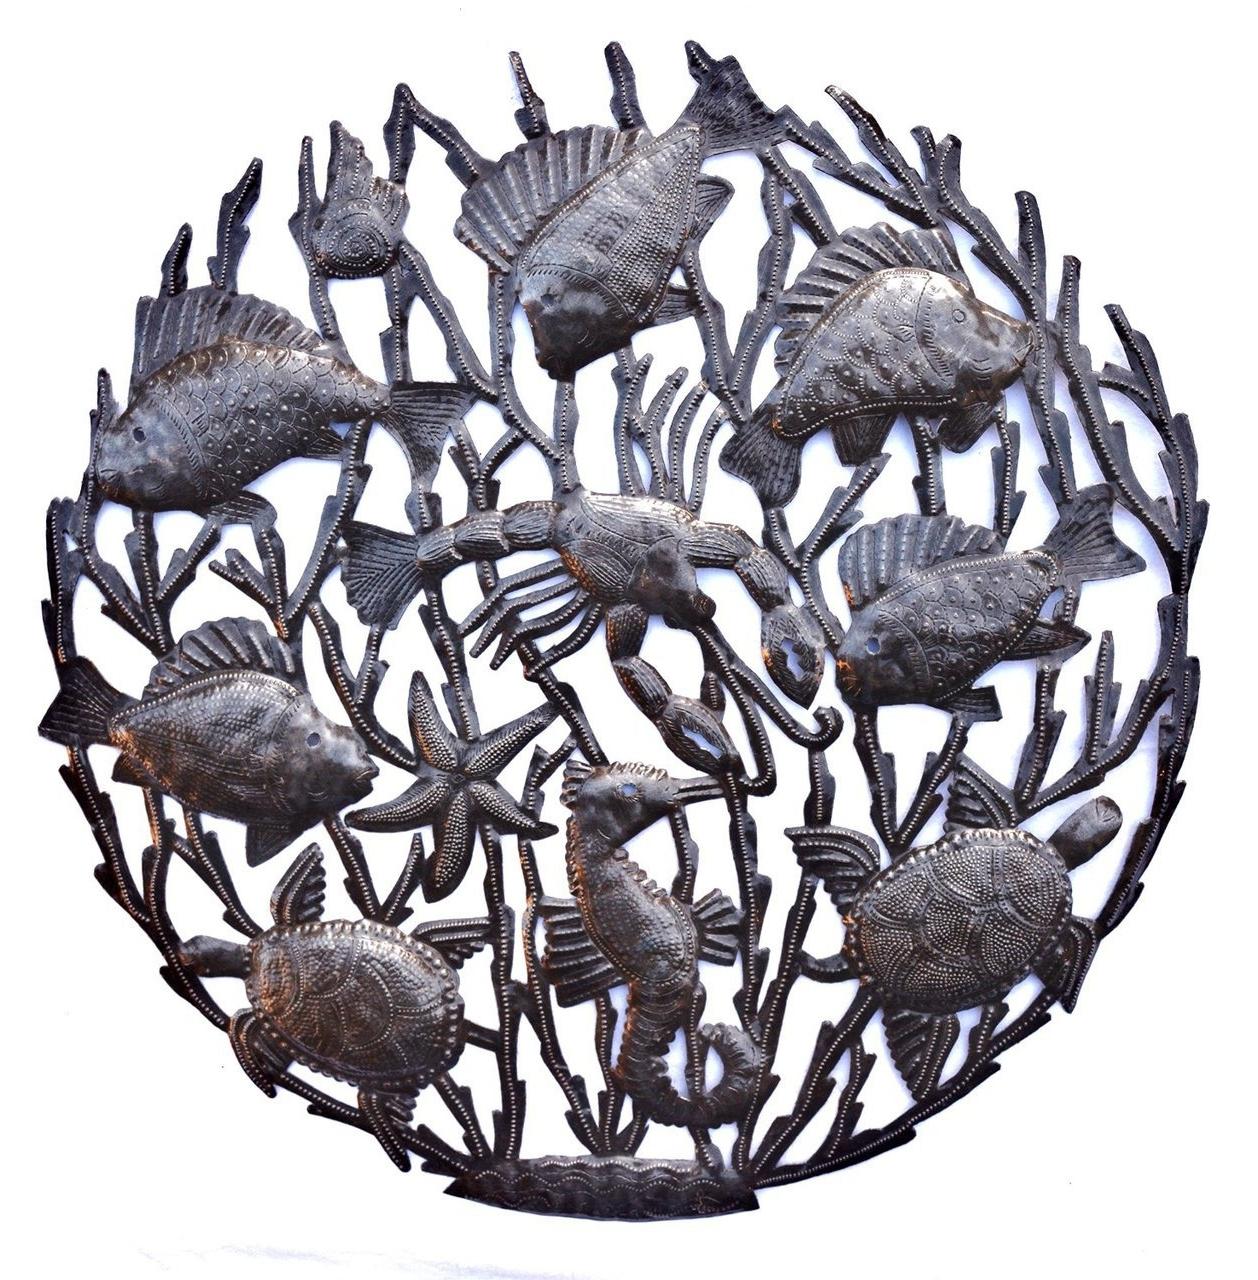 15 Best Ideas of Hammered Metal Wall Art